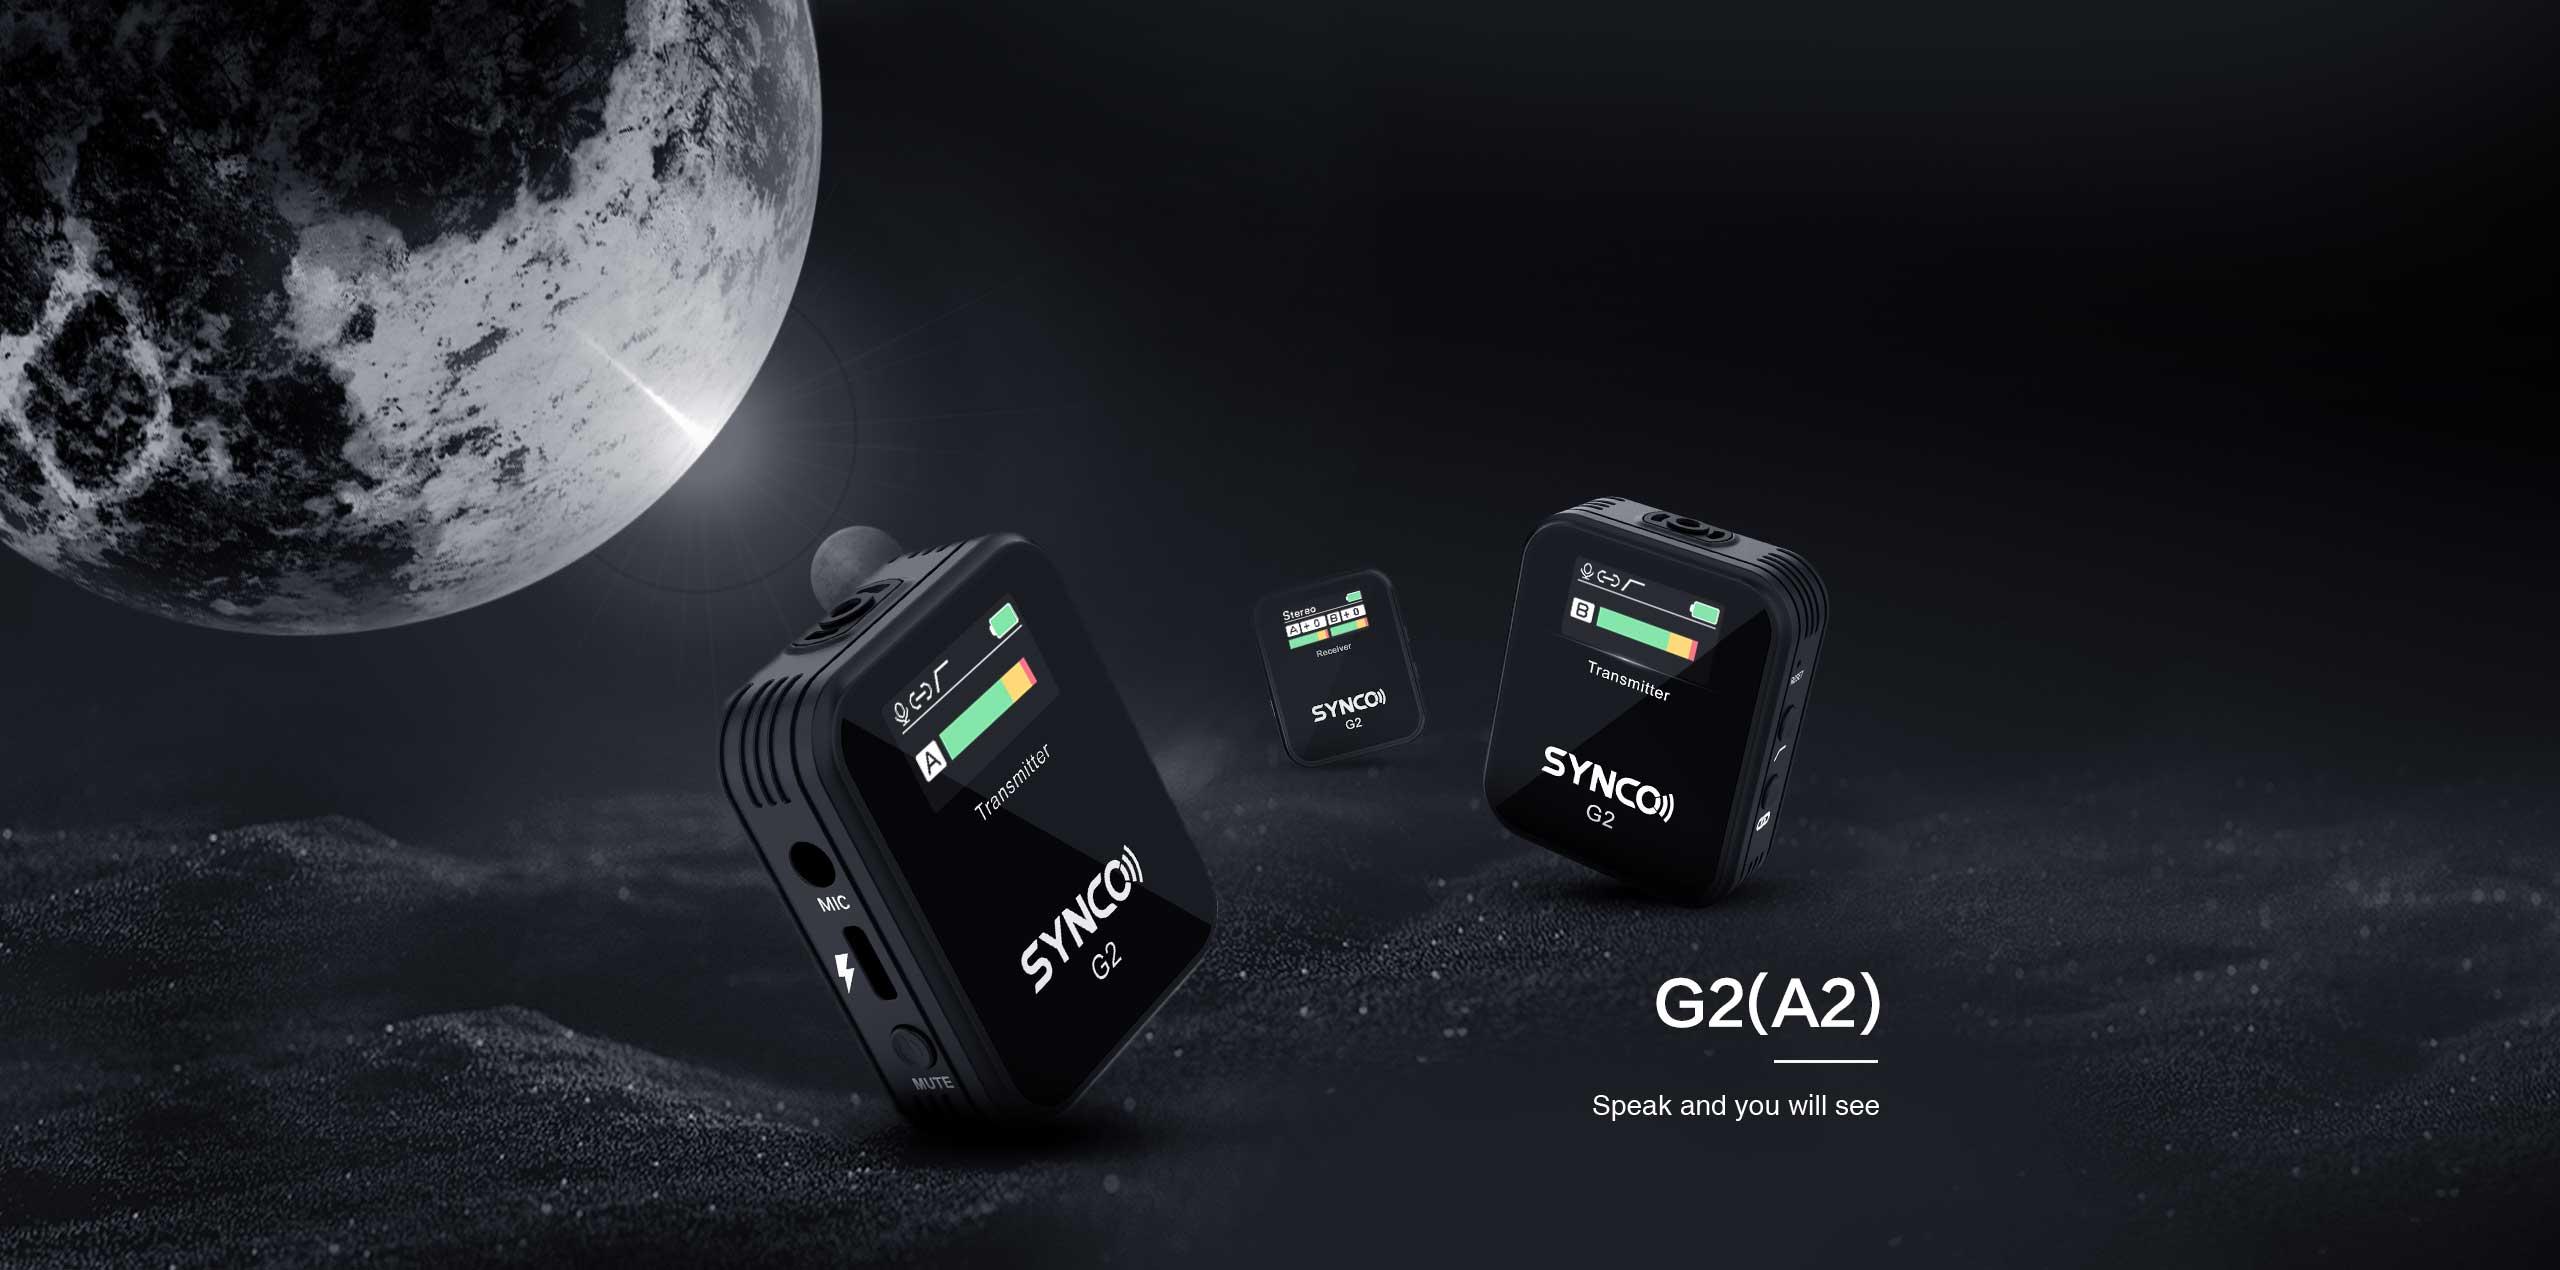 Synco G2(A2)の概要